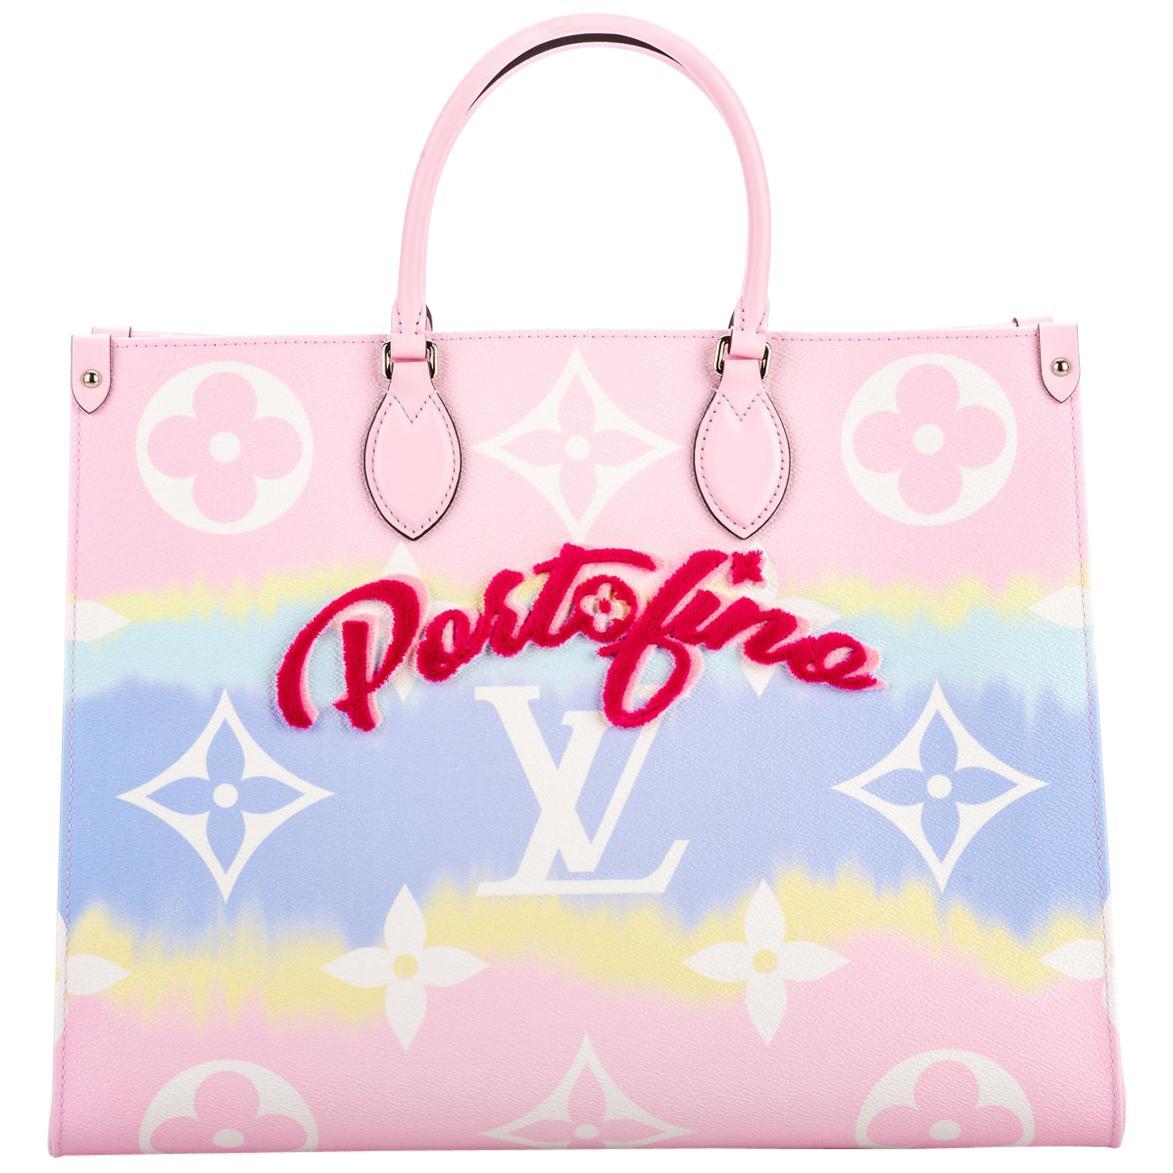 New in Box Louis Vuitton Portofino On The Go Limited Edition Bag